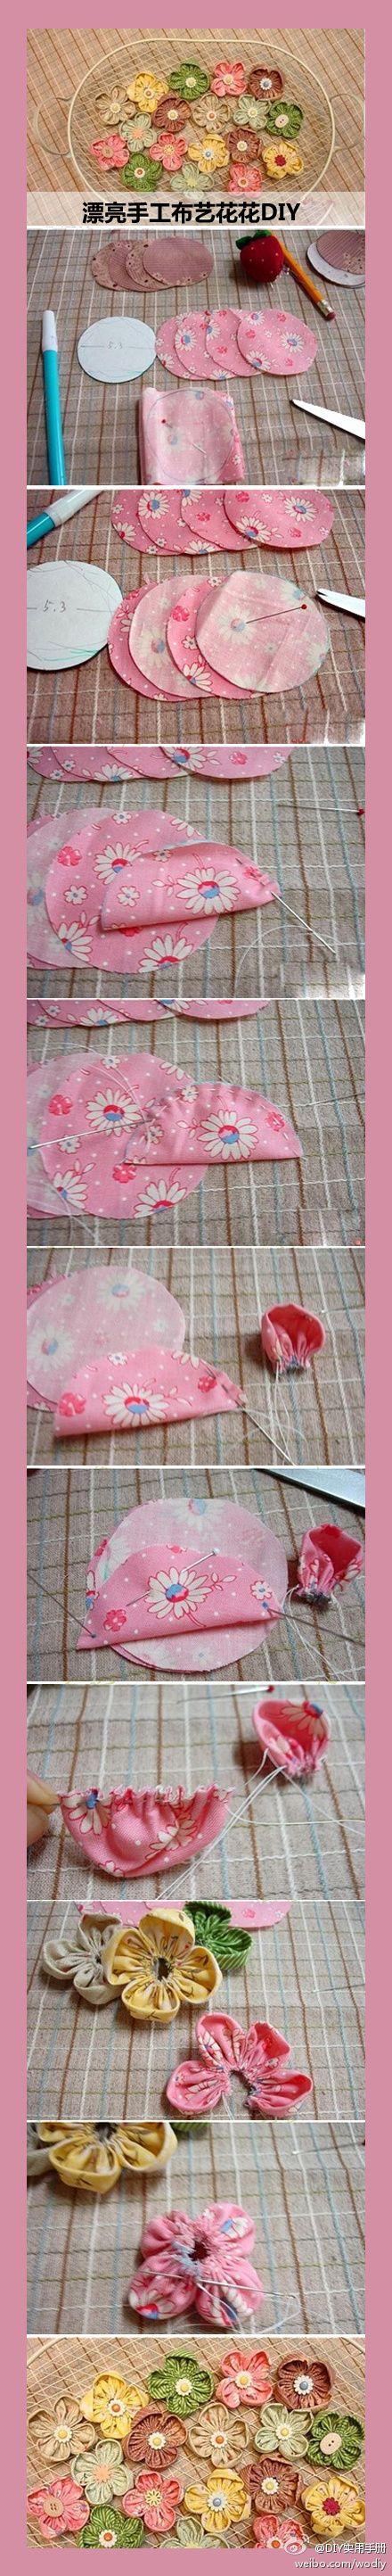 Yo yo flowers for quilt. Using vintage fabric?